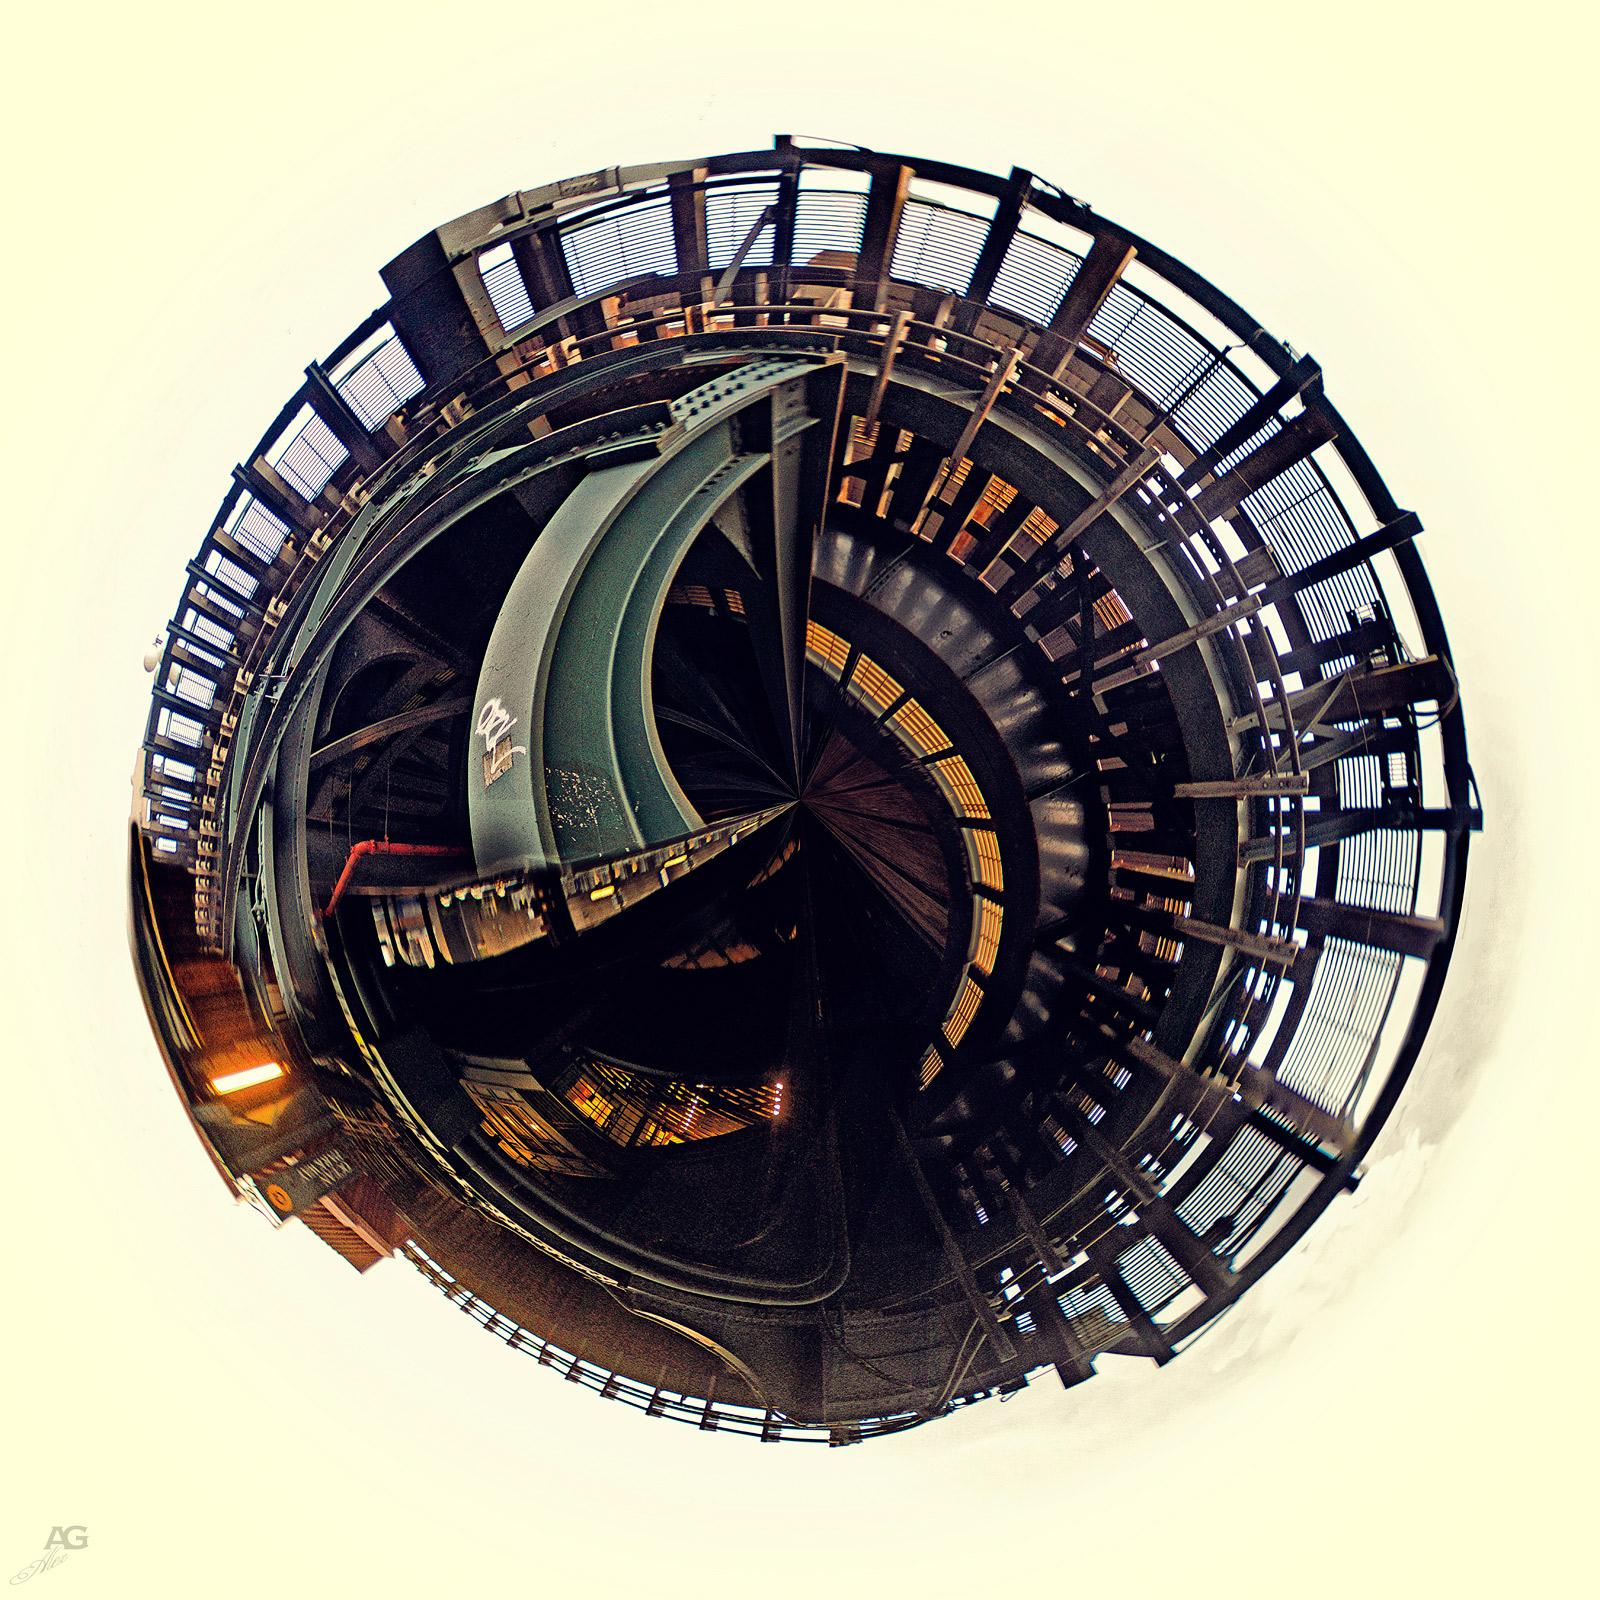 ElevatedTrainTrucksFromTheBottomOceanParkwayStationSubway_POLAR_1600